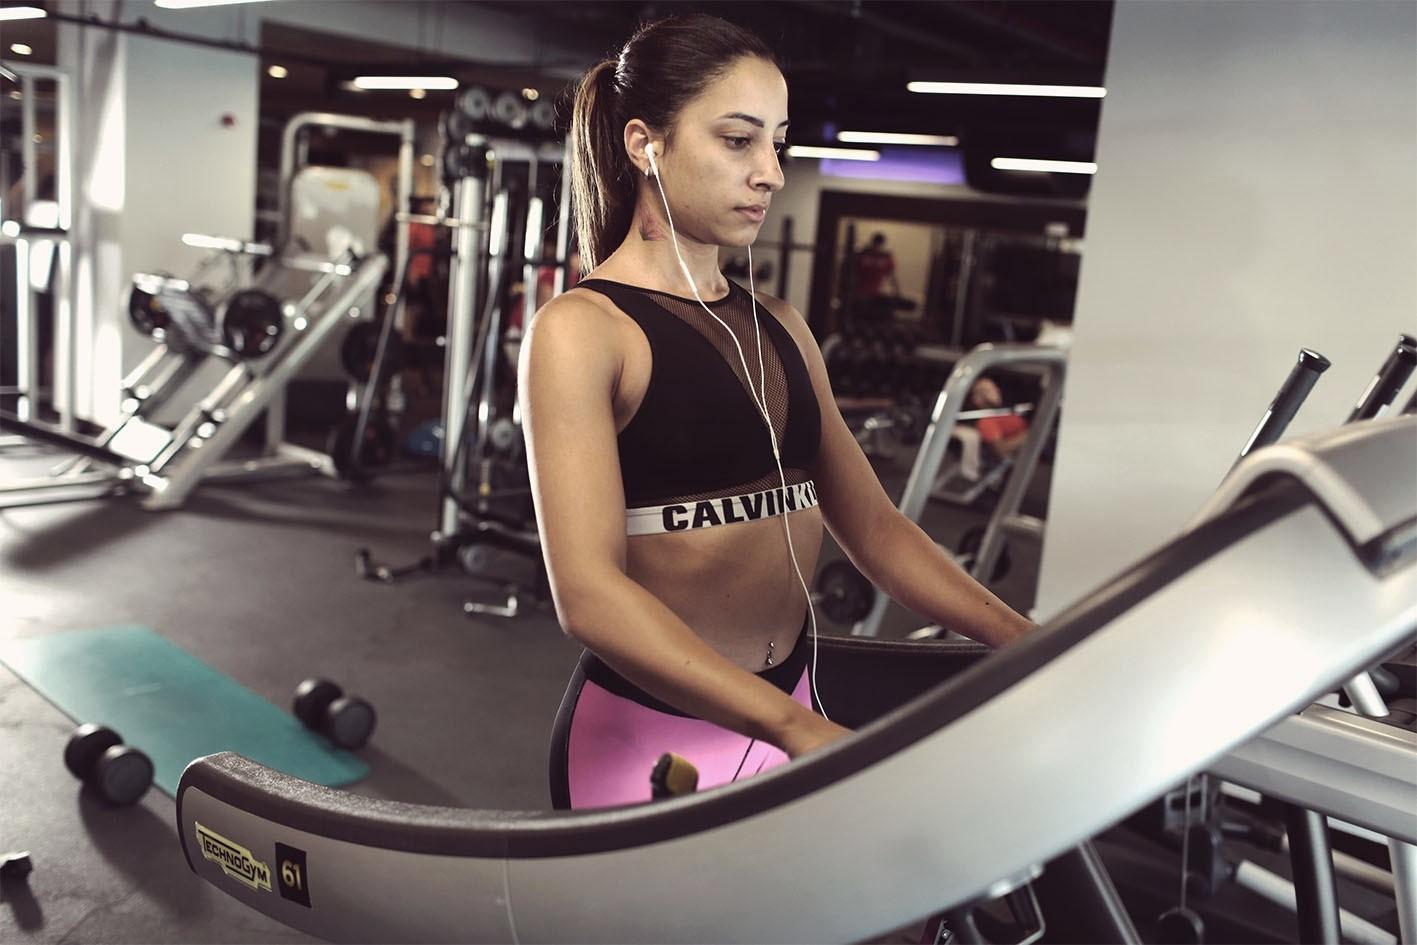 hitclub spa fitness 5p8a8152